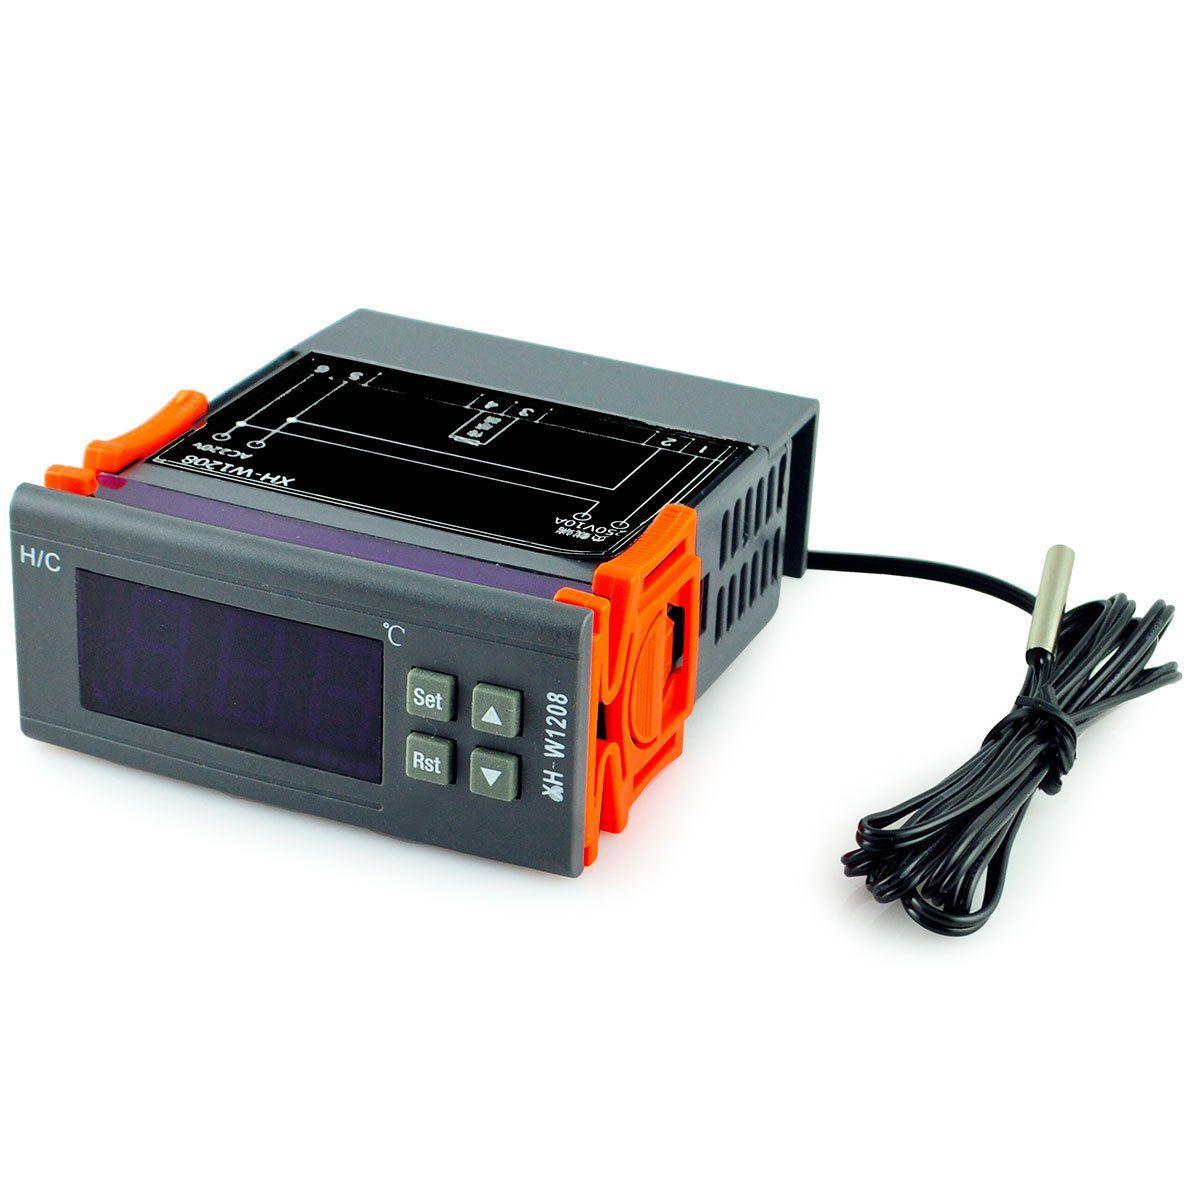 Sikio Xh W1208 1 8 Quot Lcd Digital Temperature Controller Grey 110 240v Temperature Control Thermostat Sensor